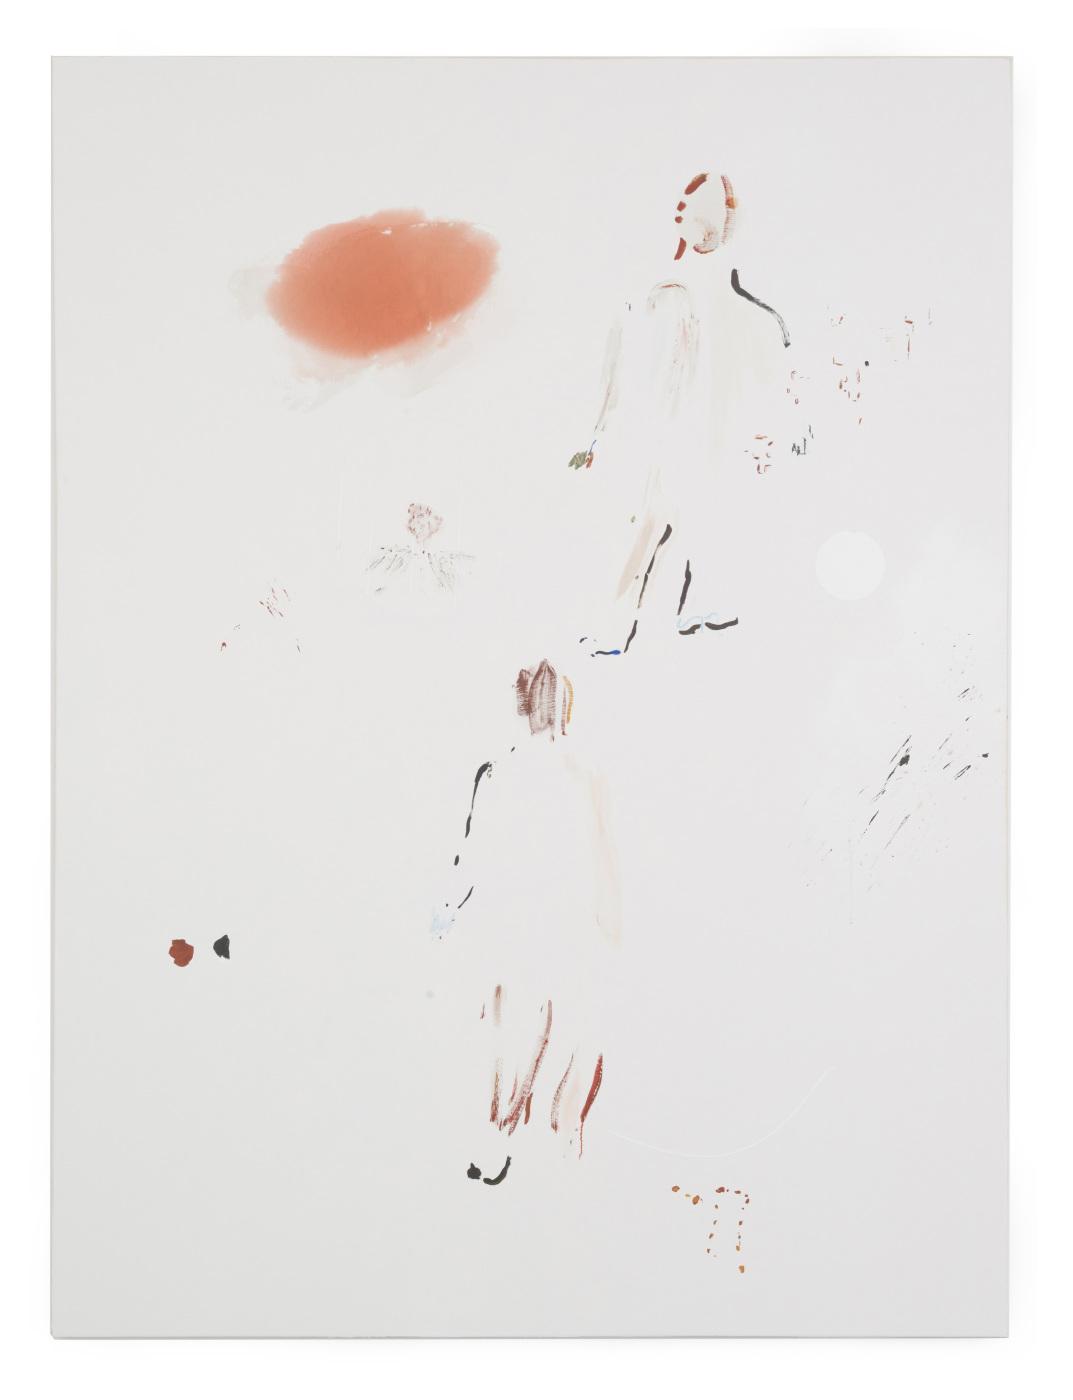 T293 - Henry Chapman - 9